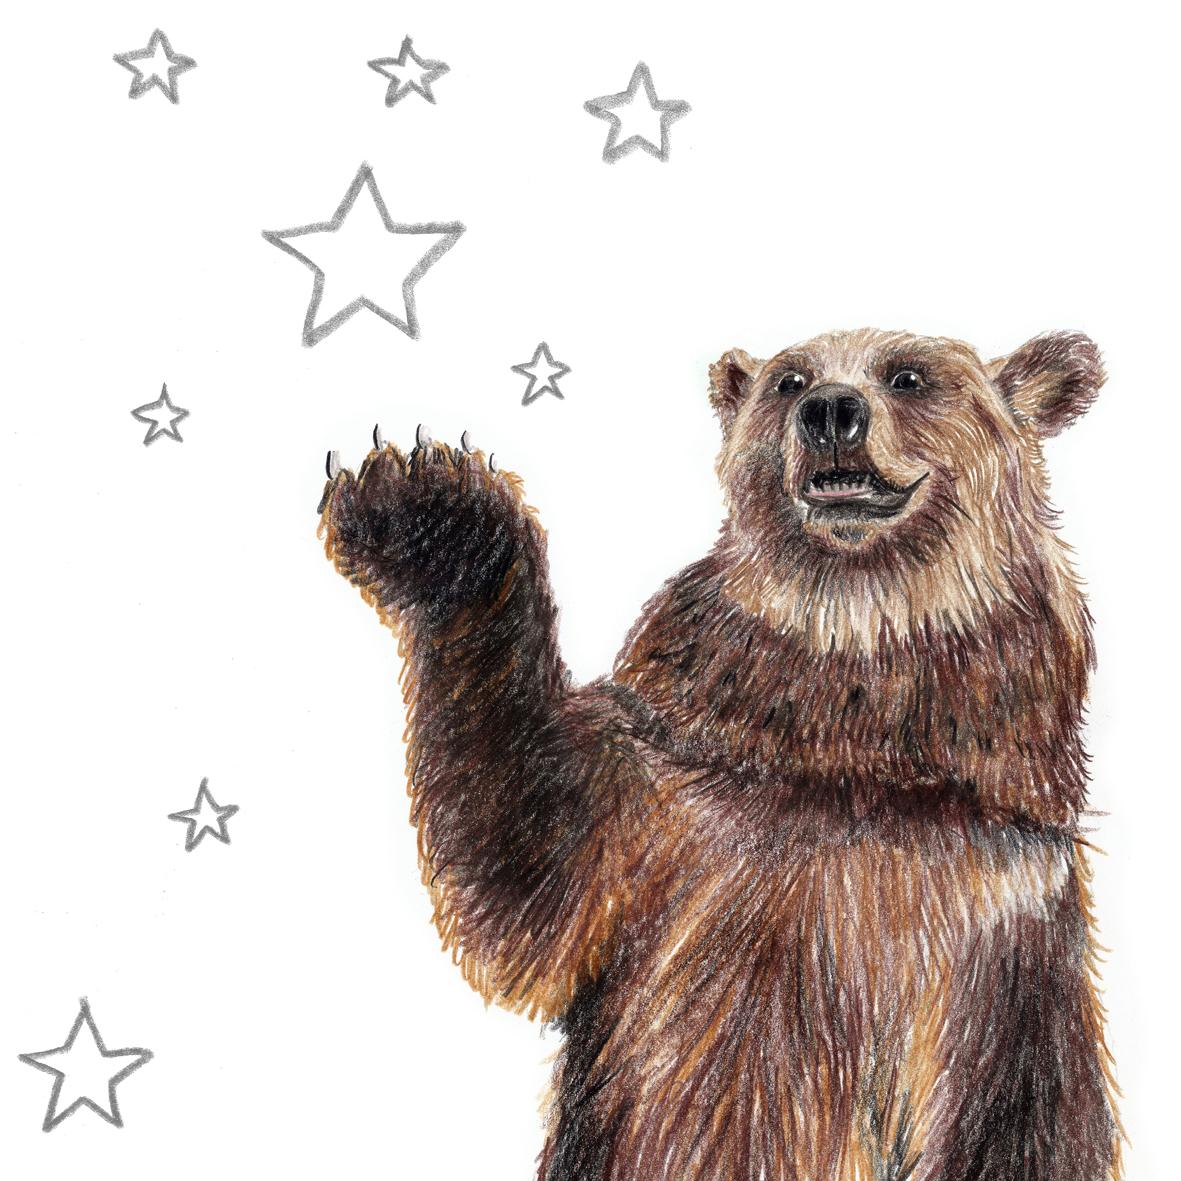 Bär mit Sternen Kunstdruck Poster DIN